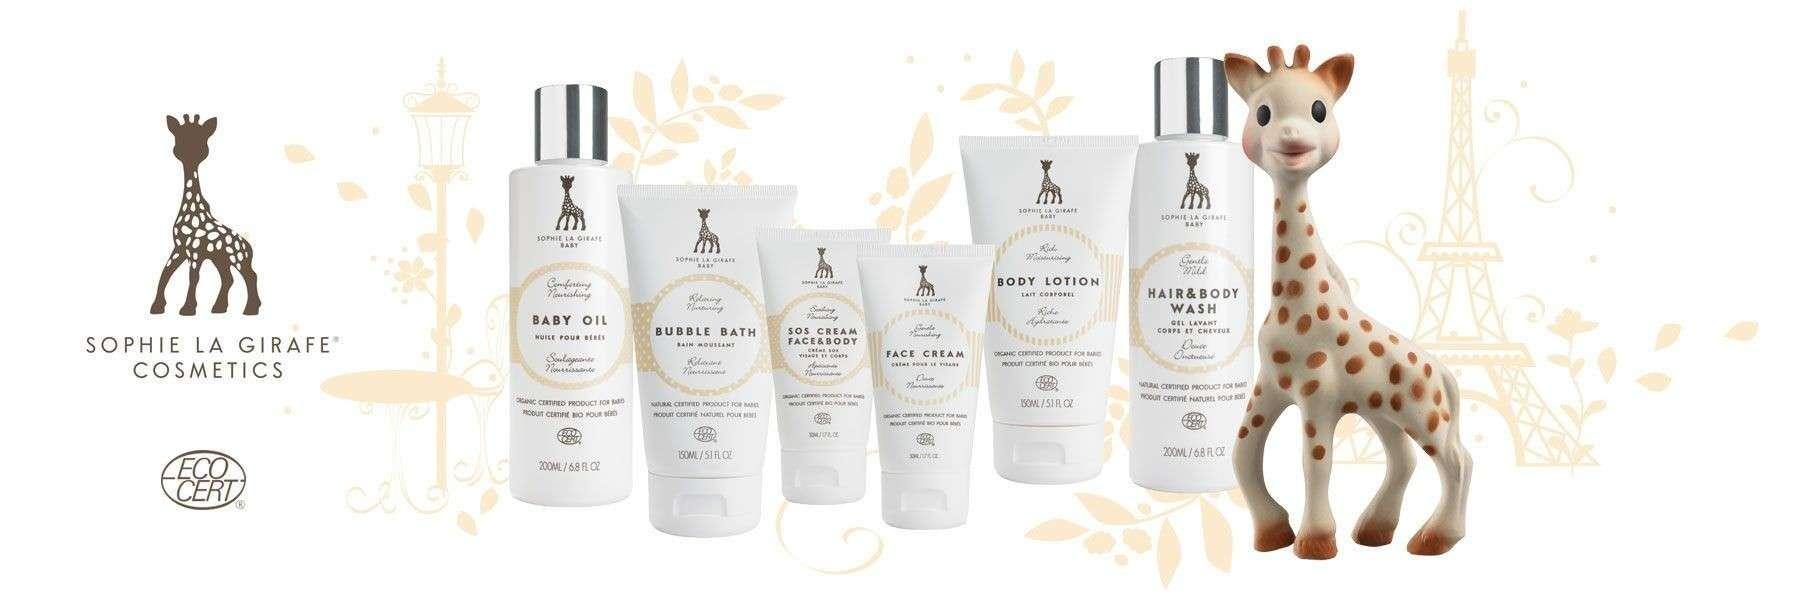 Organic cosmetics - SOPHIE LA GIRAFE